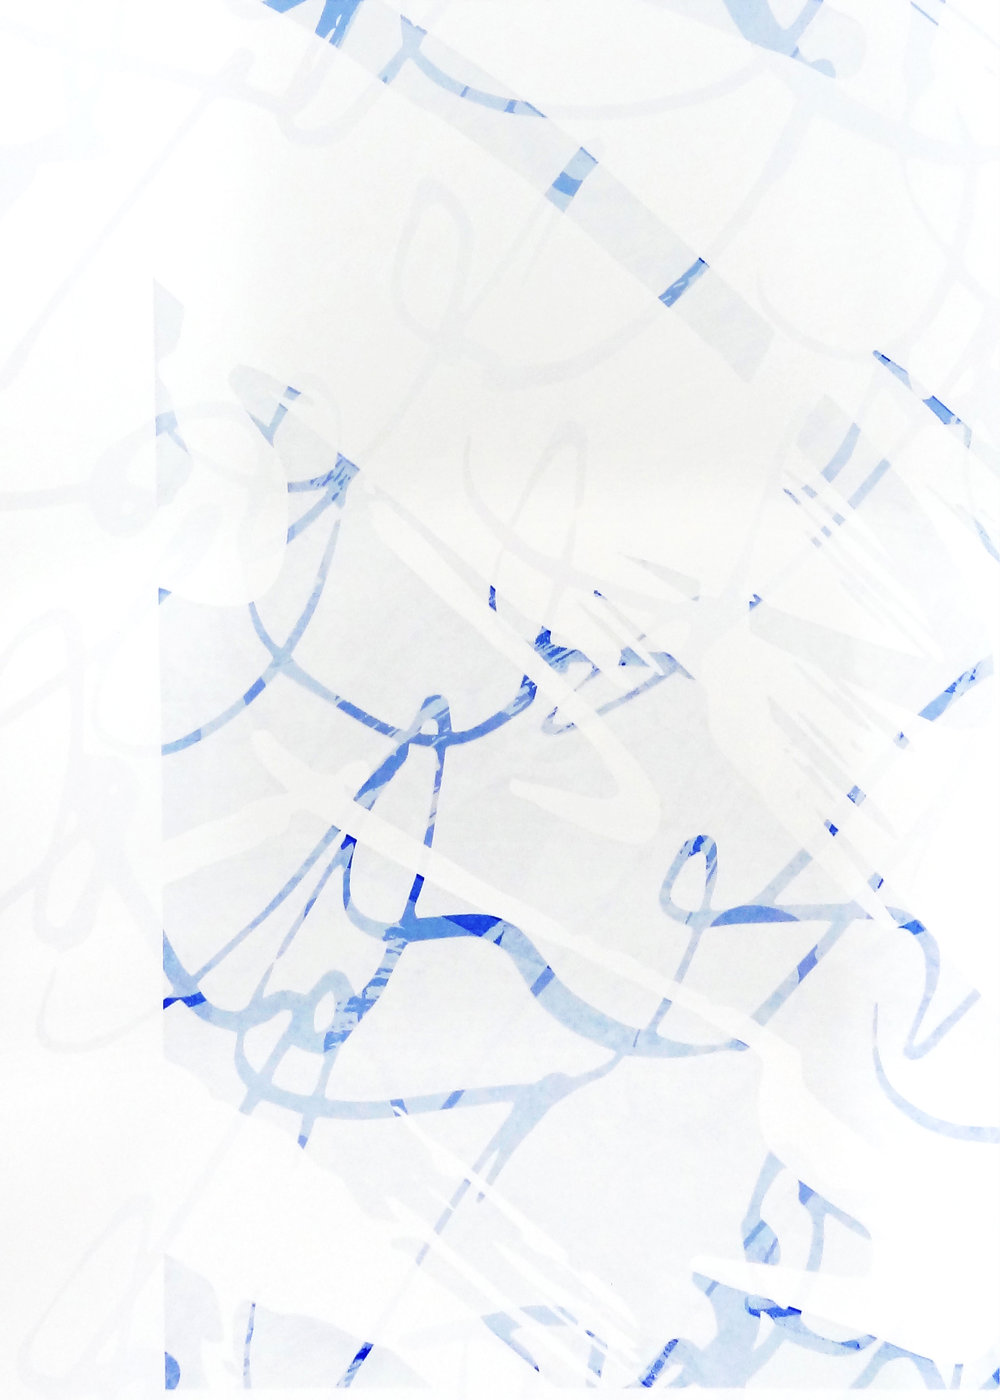 Untitled, 2018 acrylic on paper one-off screenprint 57 x 40 cm (25-18)